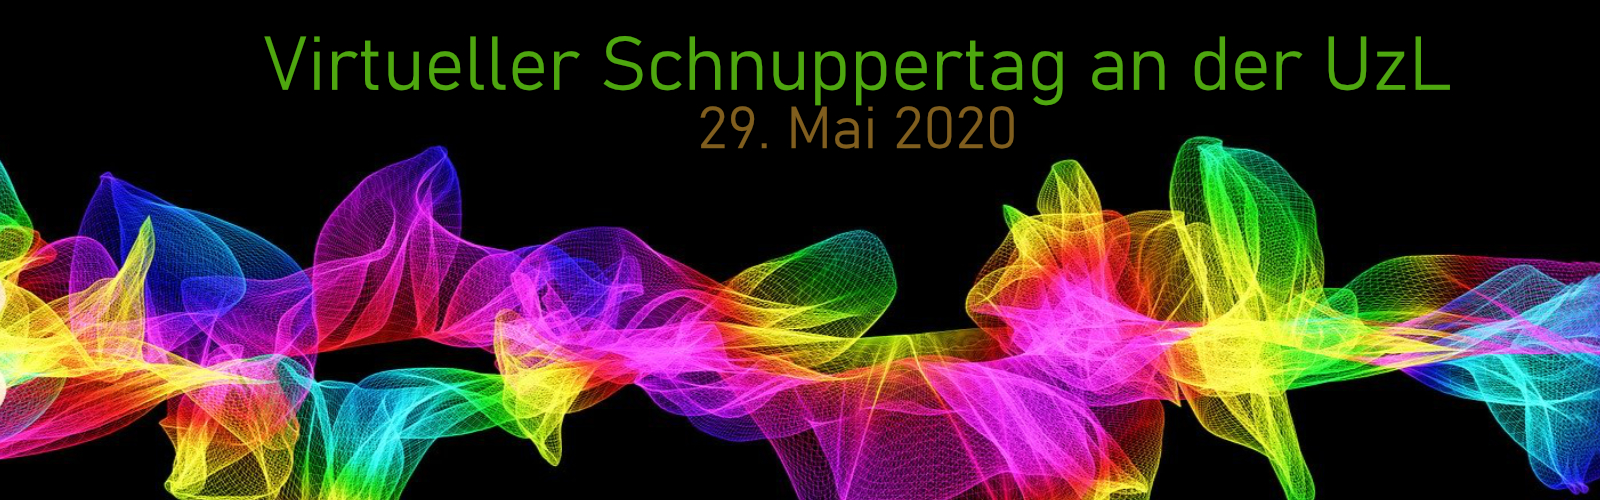 Schnuppertag-UzL